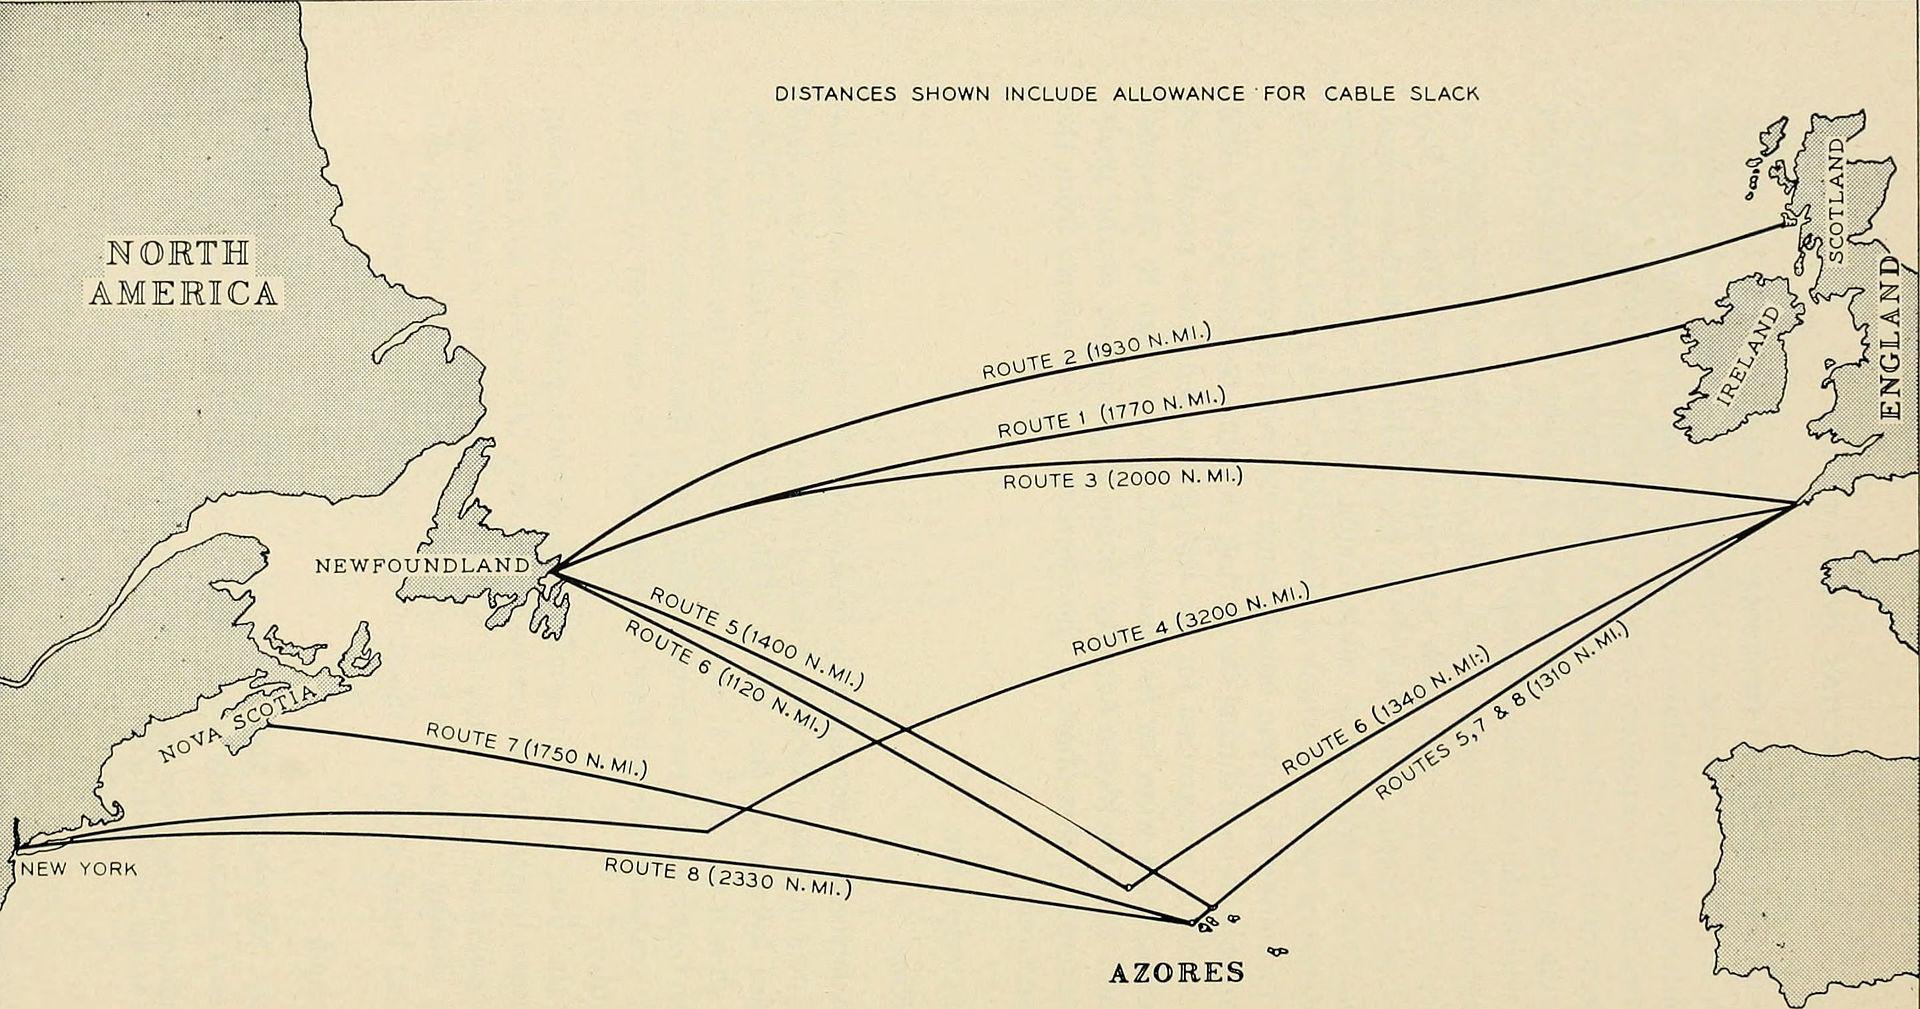 Как зарождалась инфраструктура интернета / Блог компании IT-GRAD / Хабр